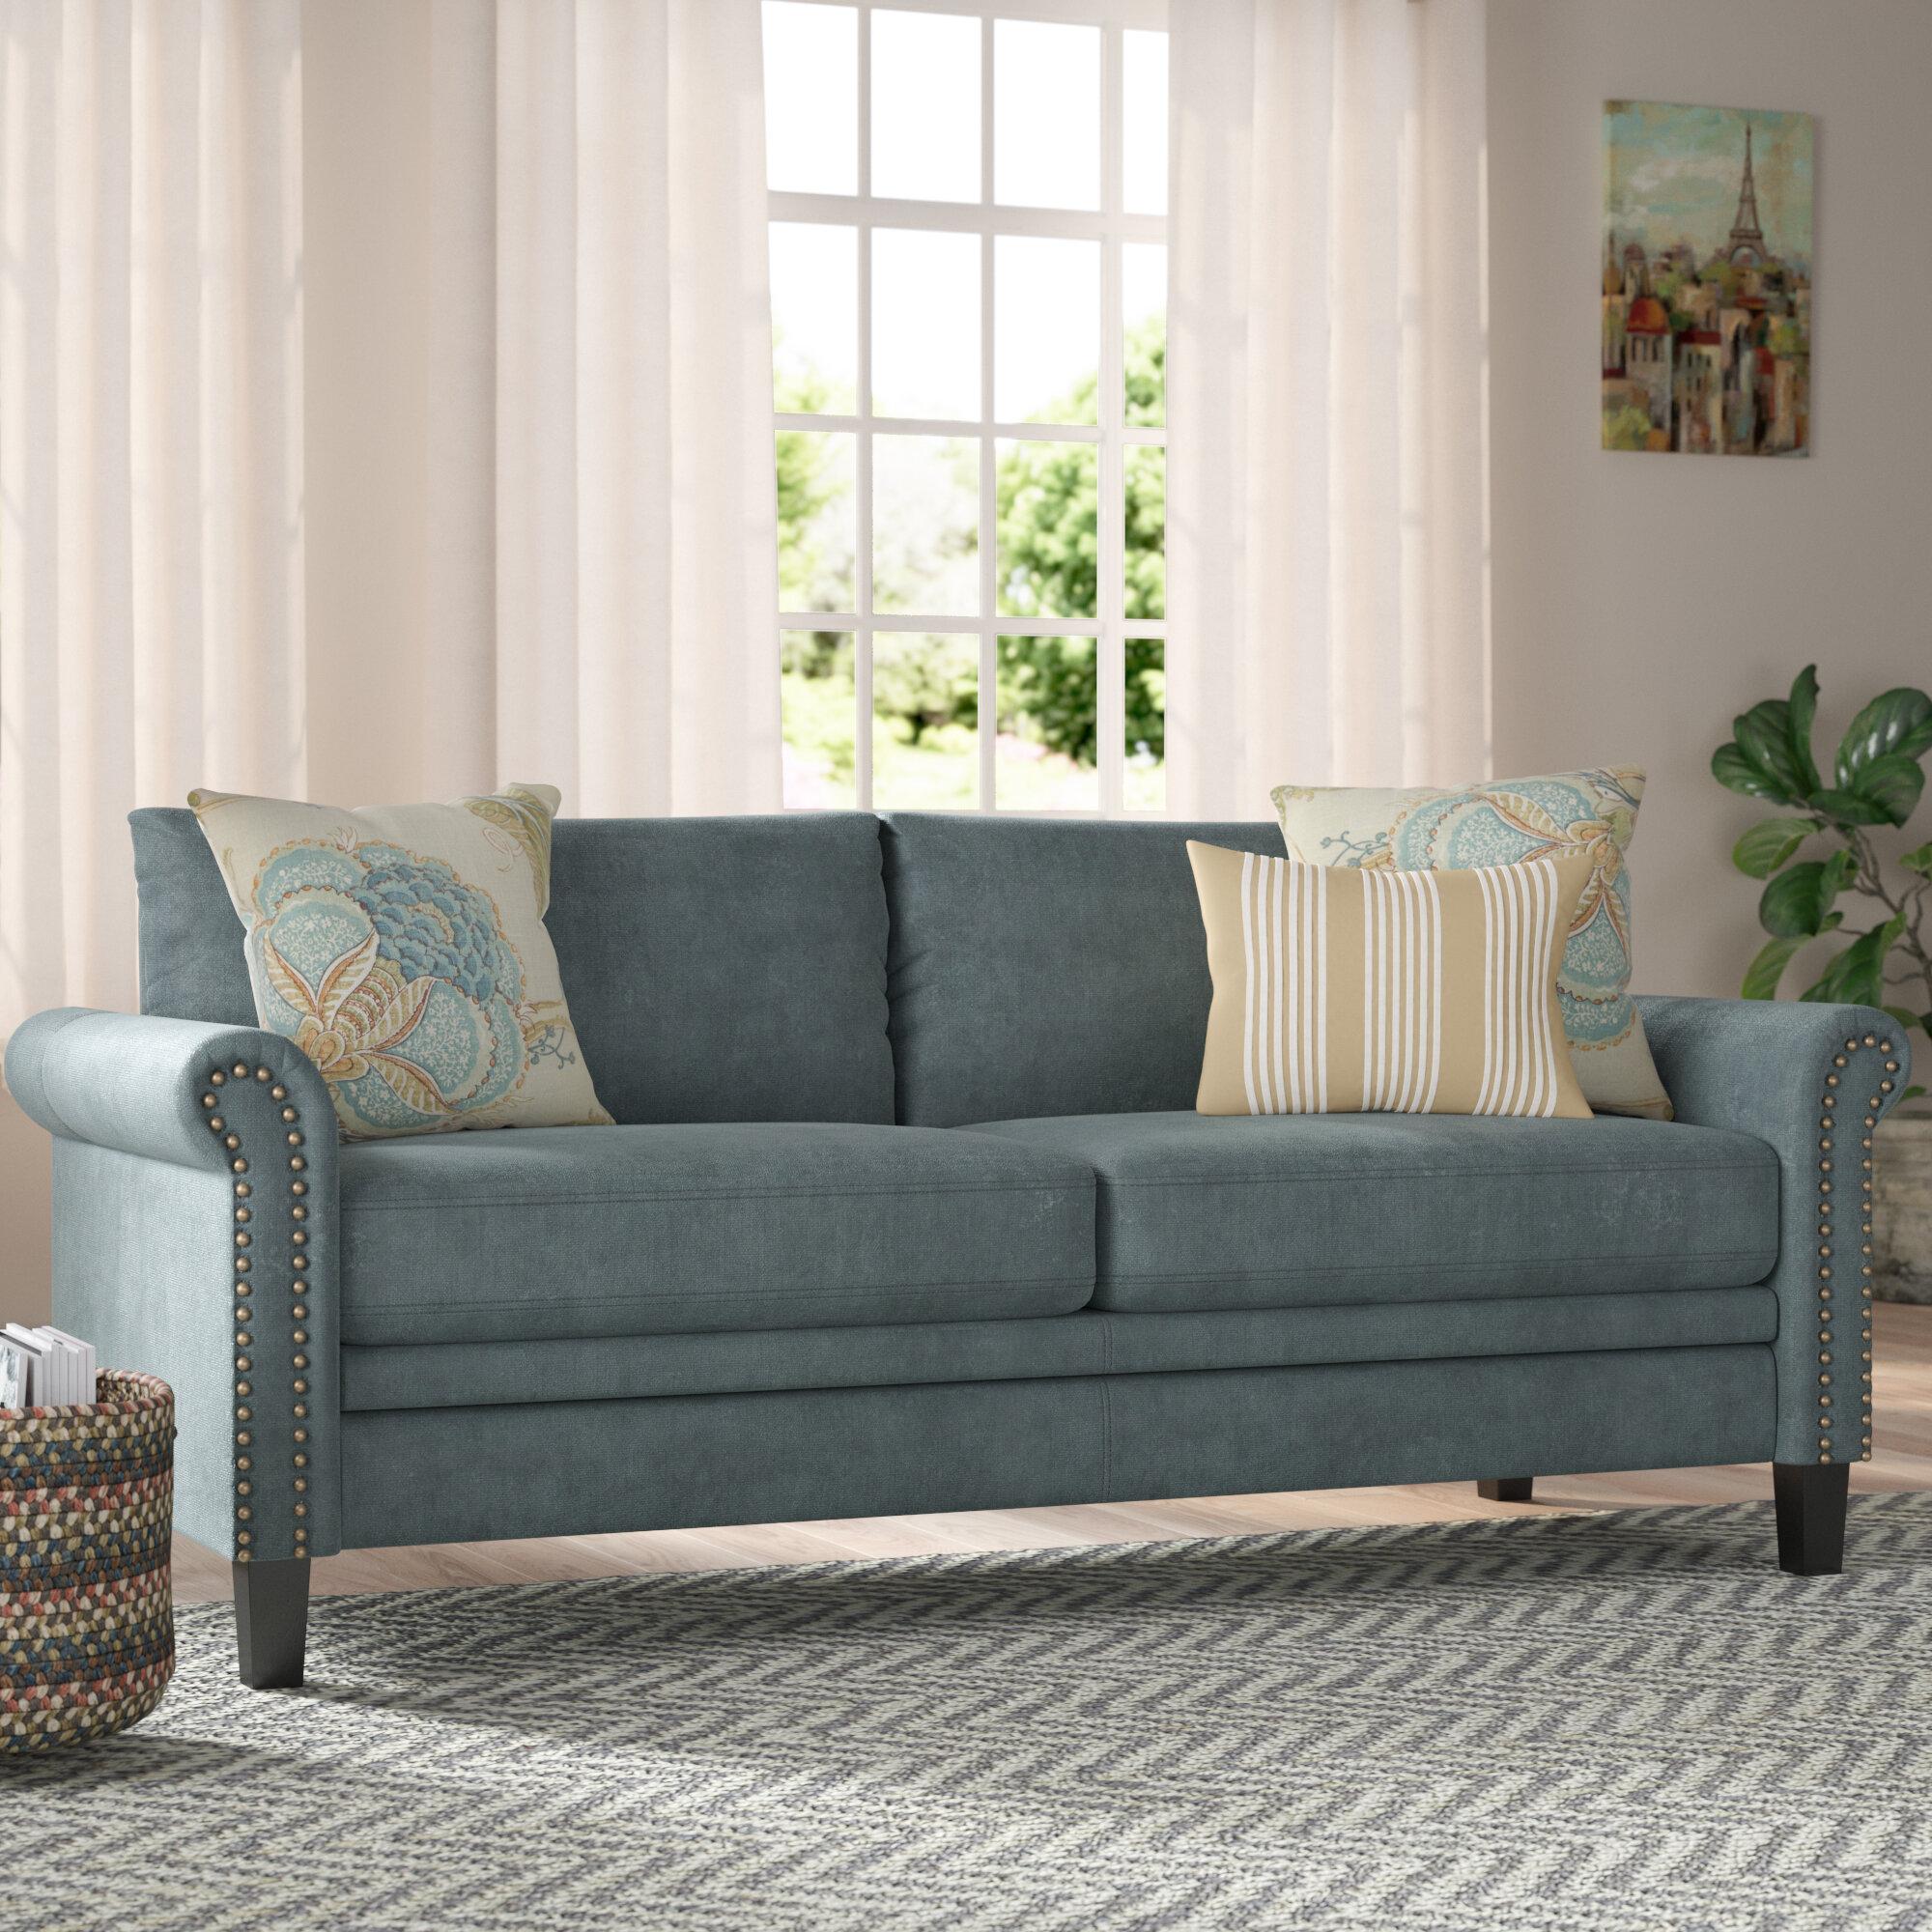 Charlton Home Childress Sofa U0026 Reviews | Wayfair